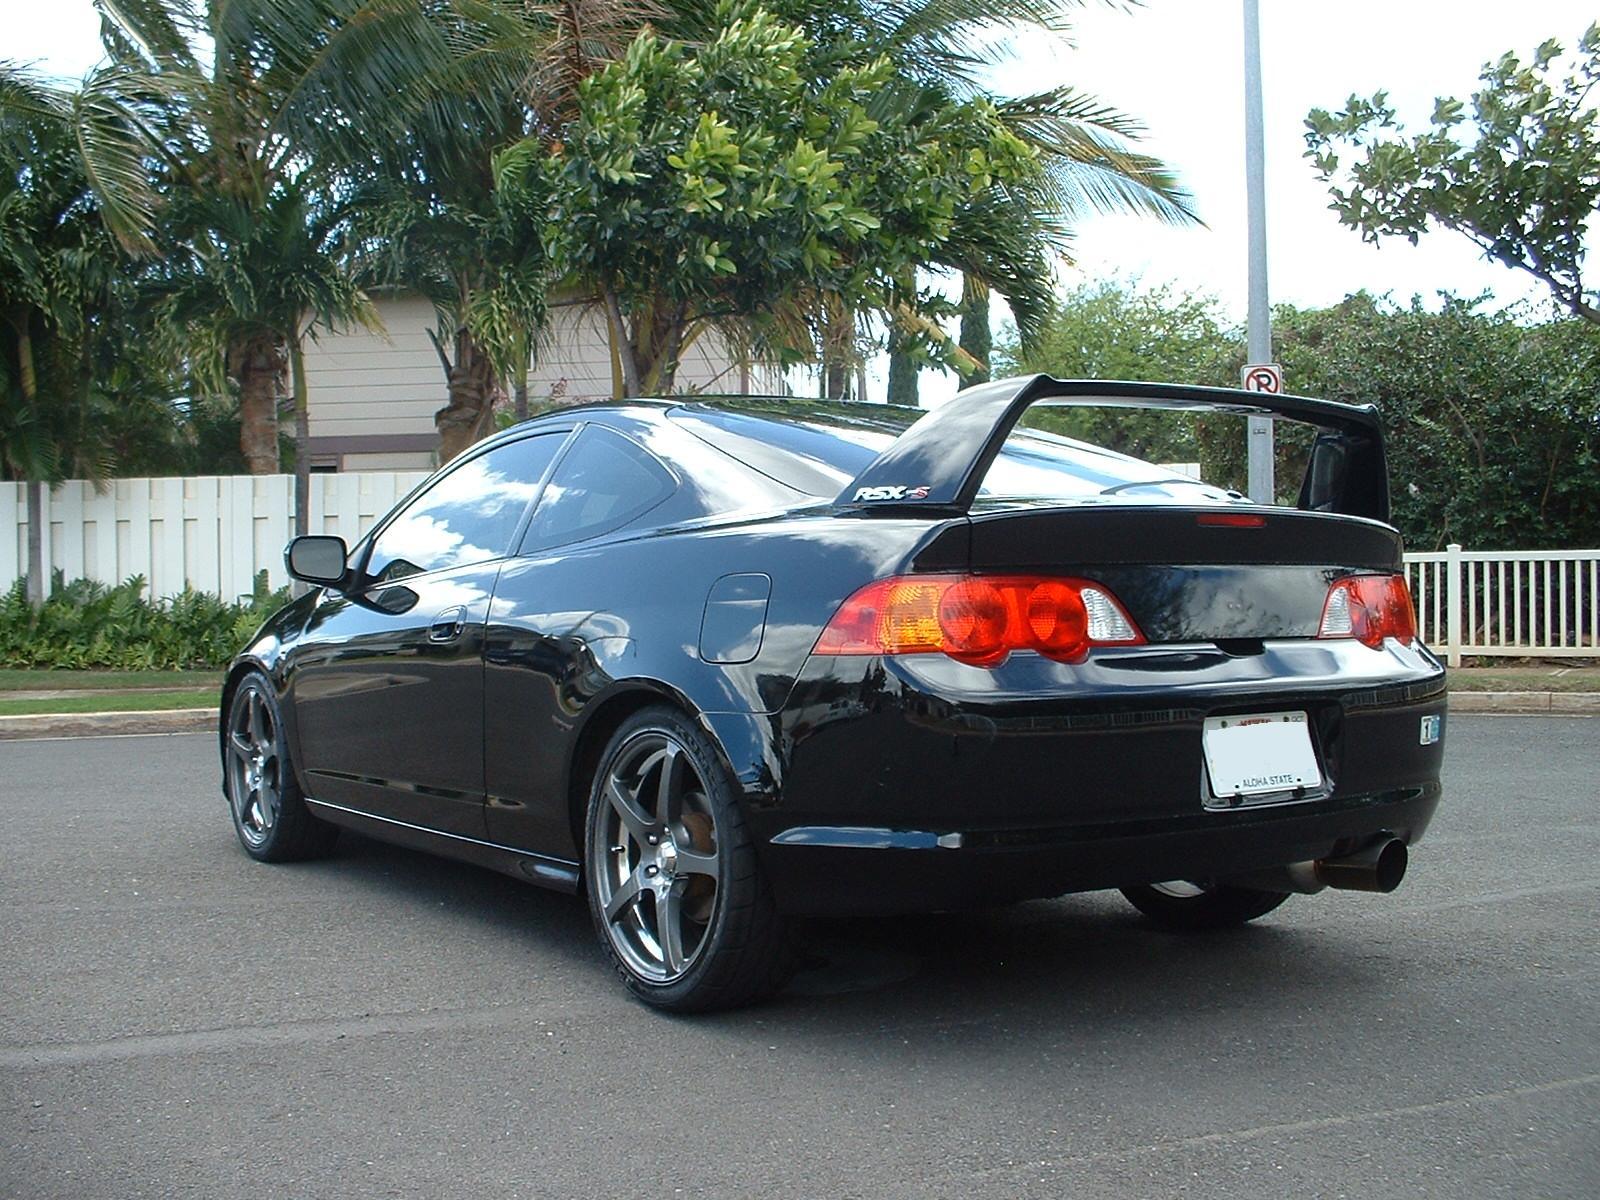 Sexy Moto: Acura Rsx